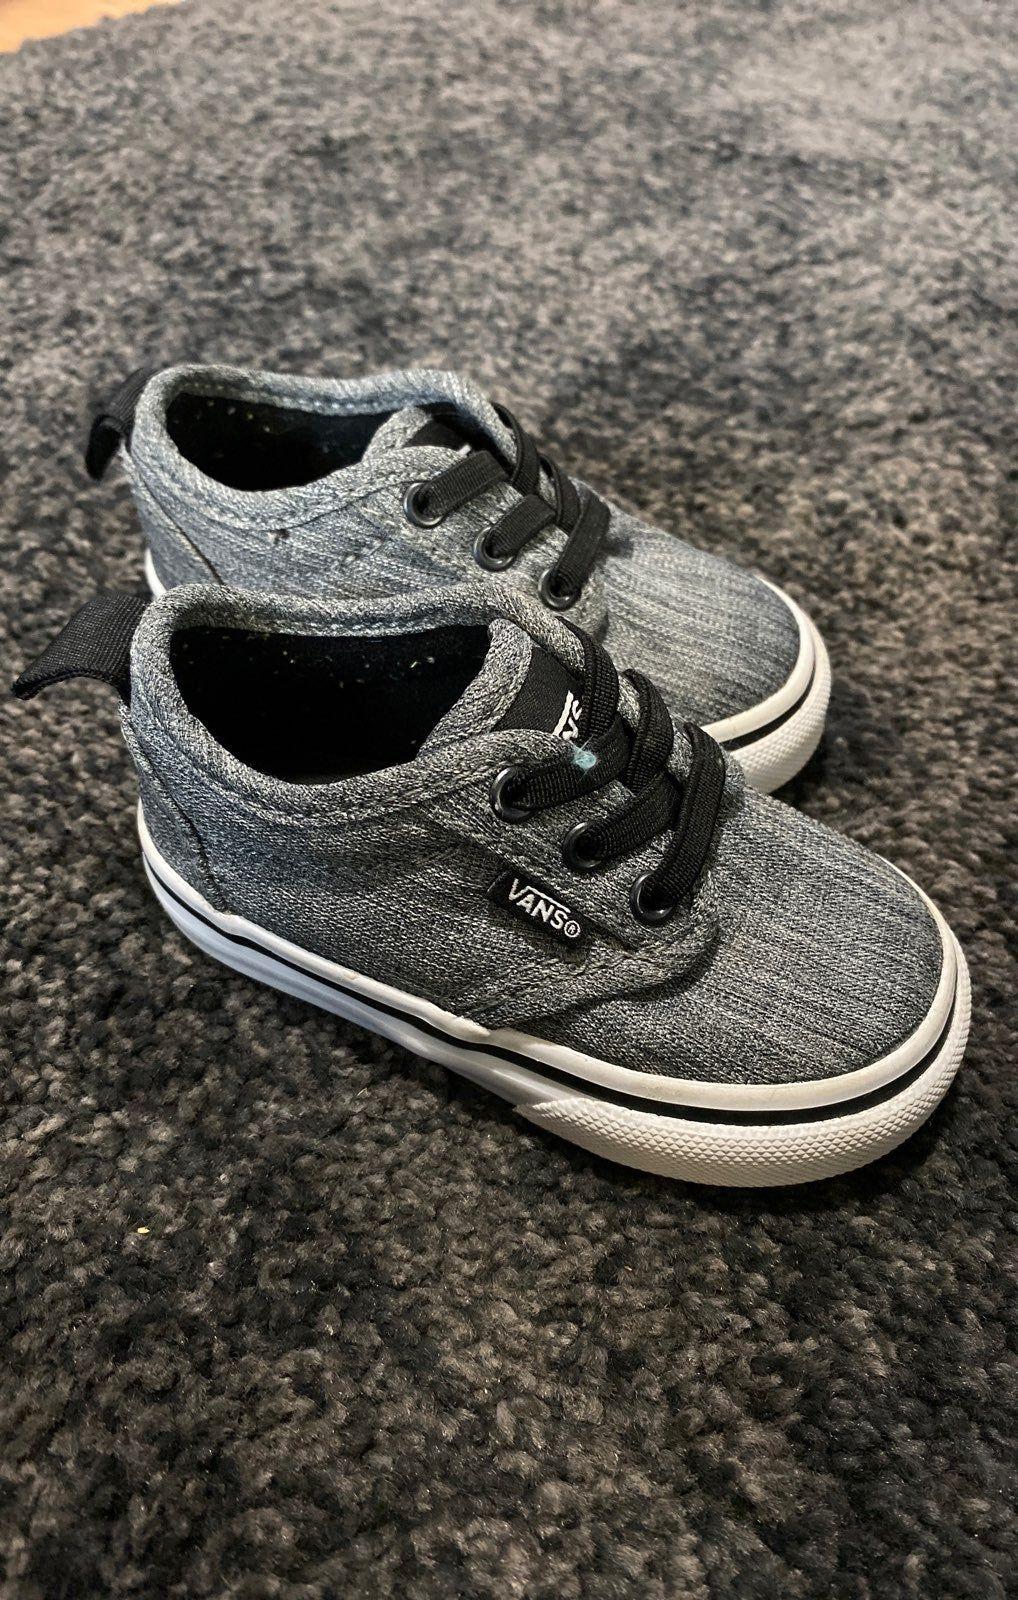 vans trainers size 4